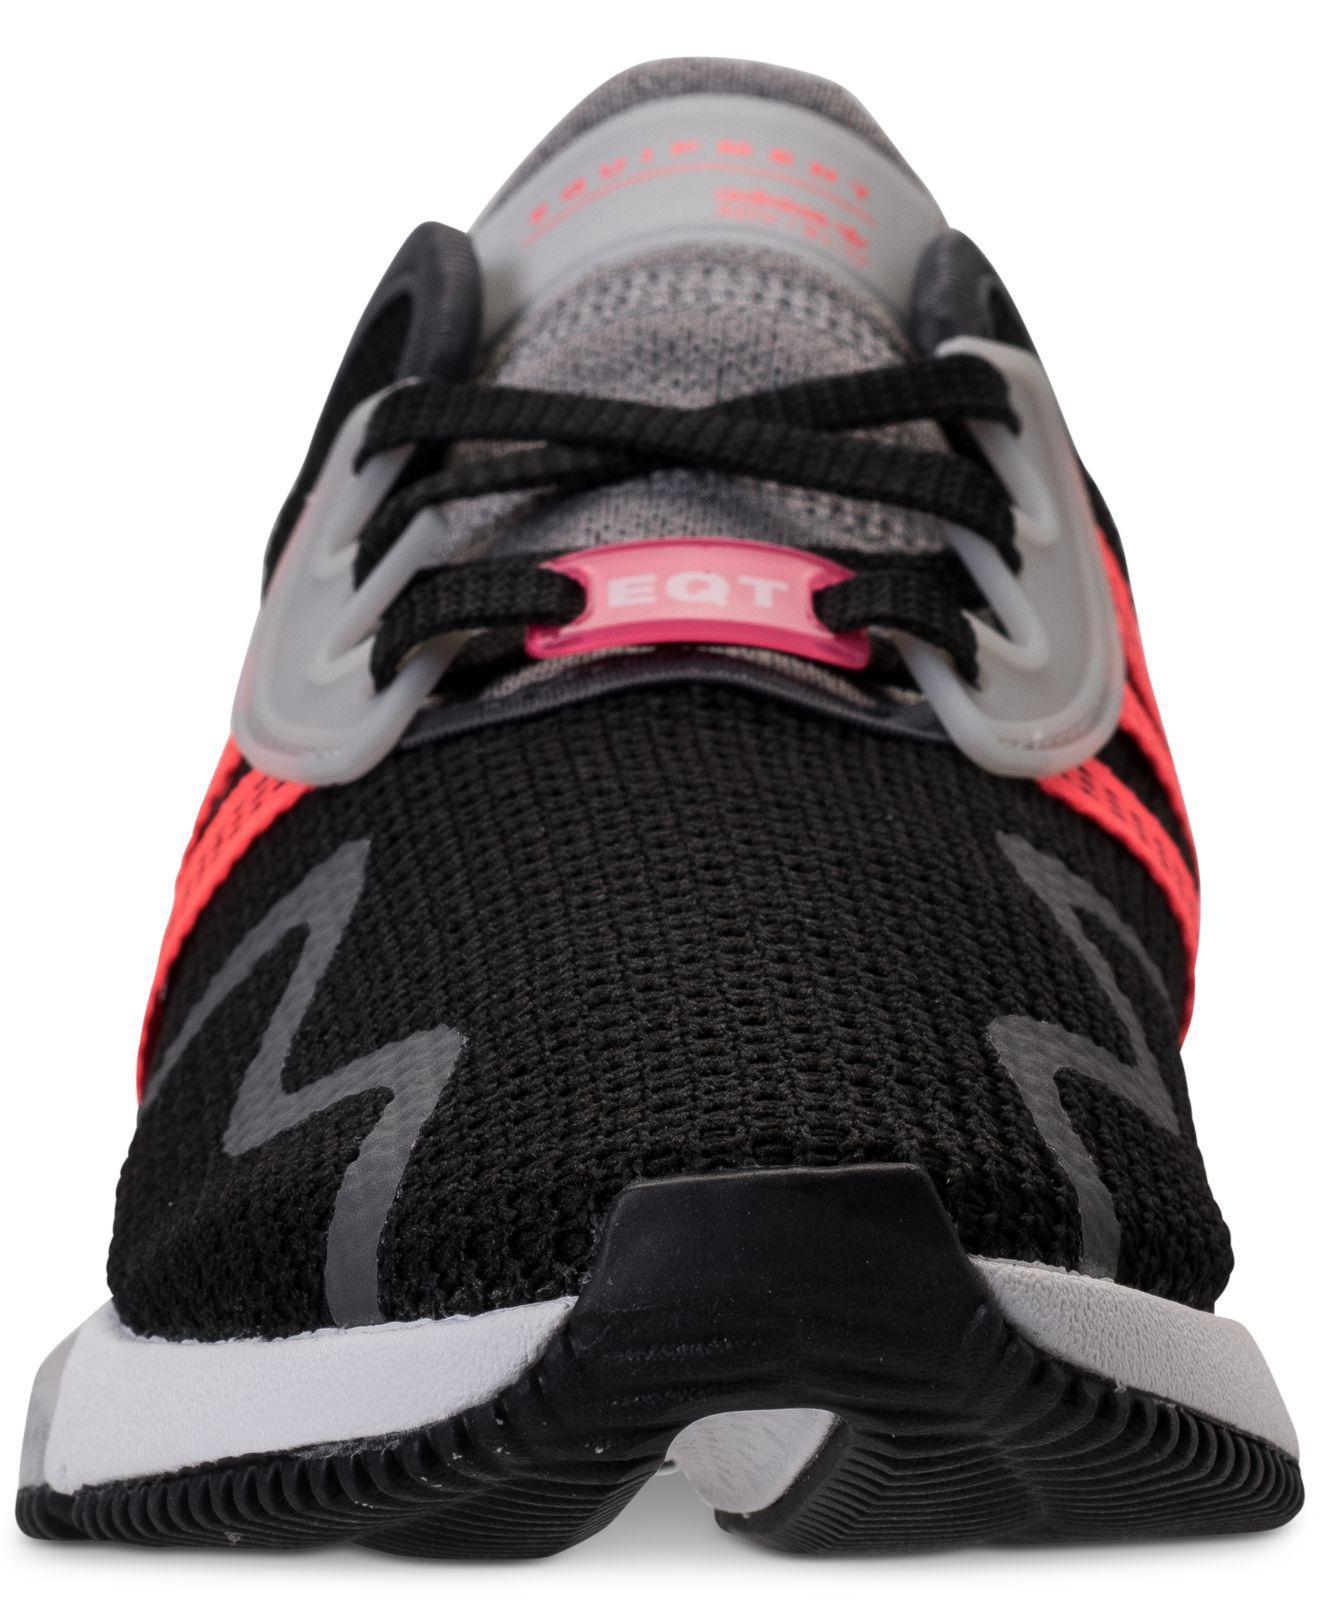 best service 07ae5 1c101 adidas-CBLACKSUBGRNFTWWHT-Originals-Eqt-Cushion-Adv -Casual-Sneakers-From-Finish-Line.jpeg